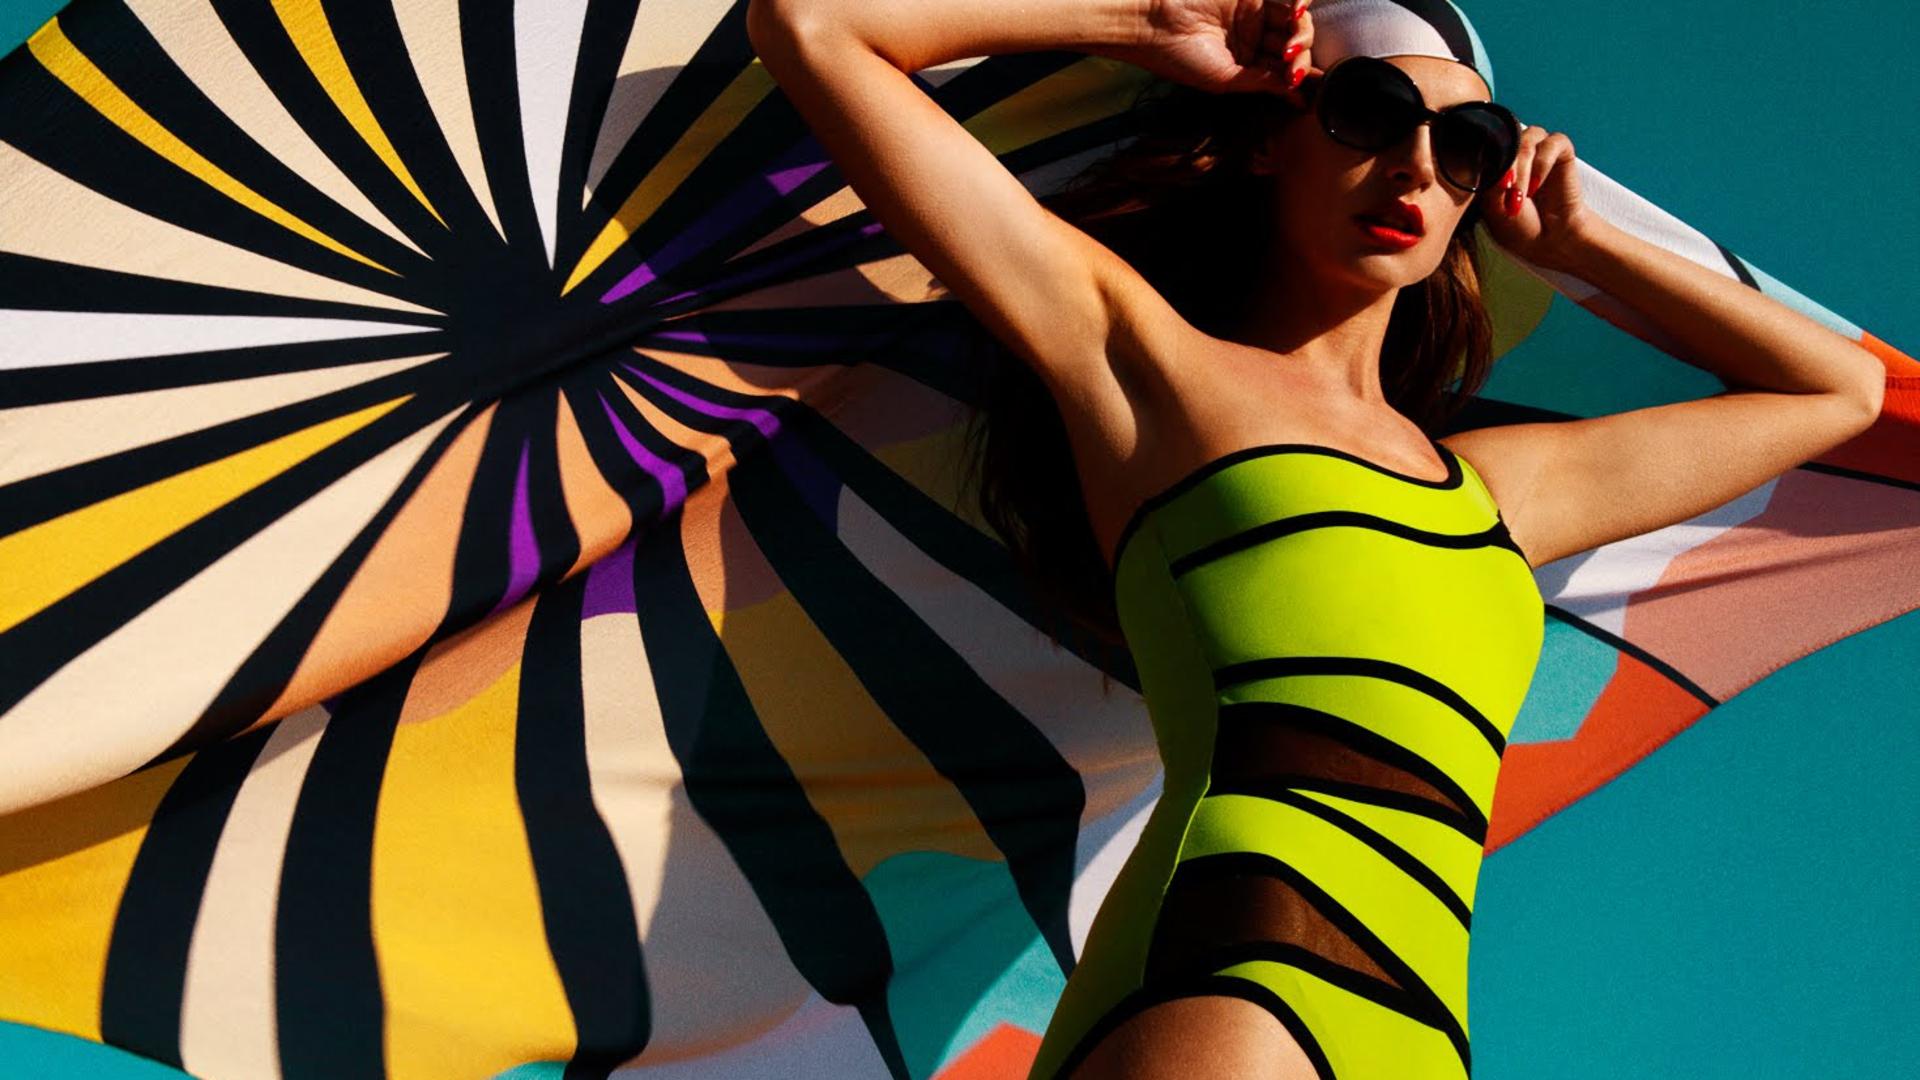 summer-fashion-girls-fashion-backgrounds-fashion-girls-summer-26057